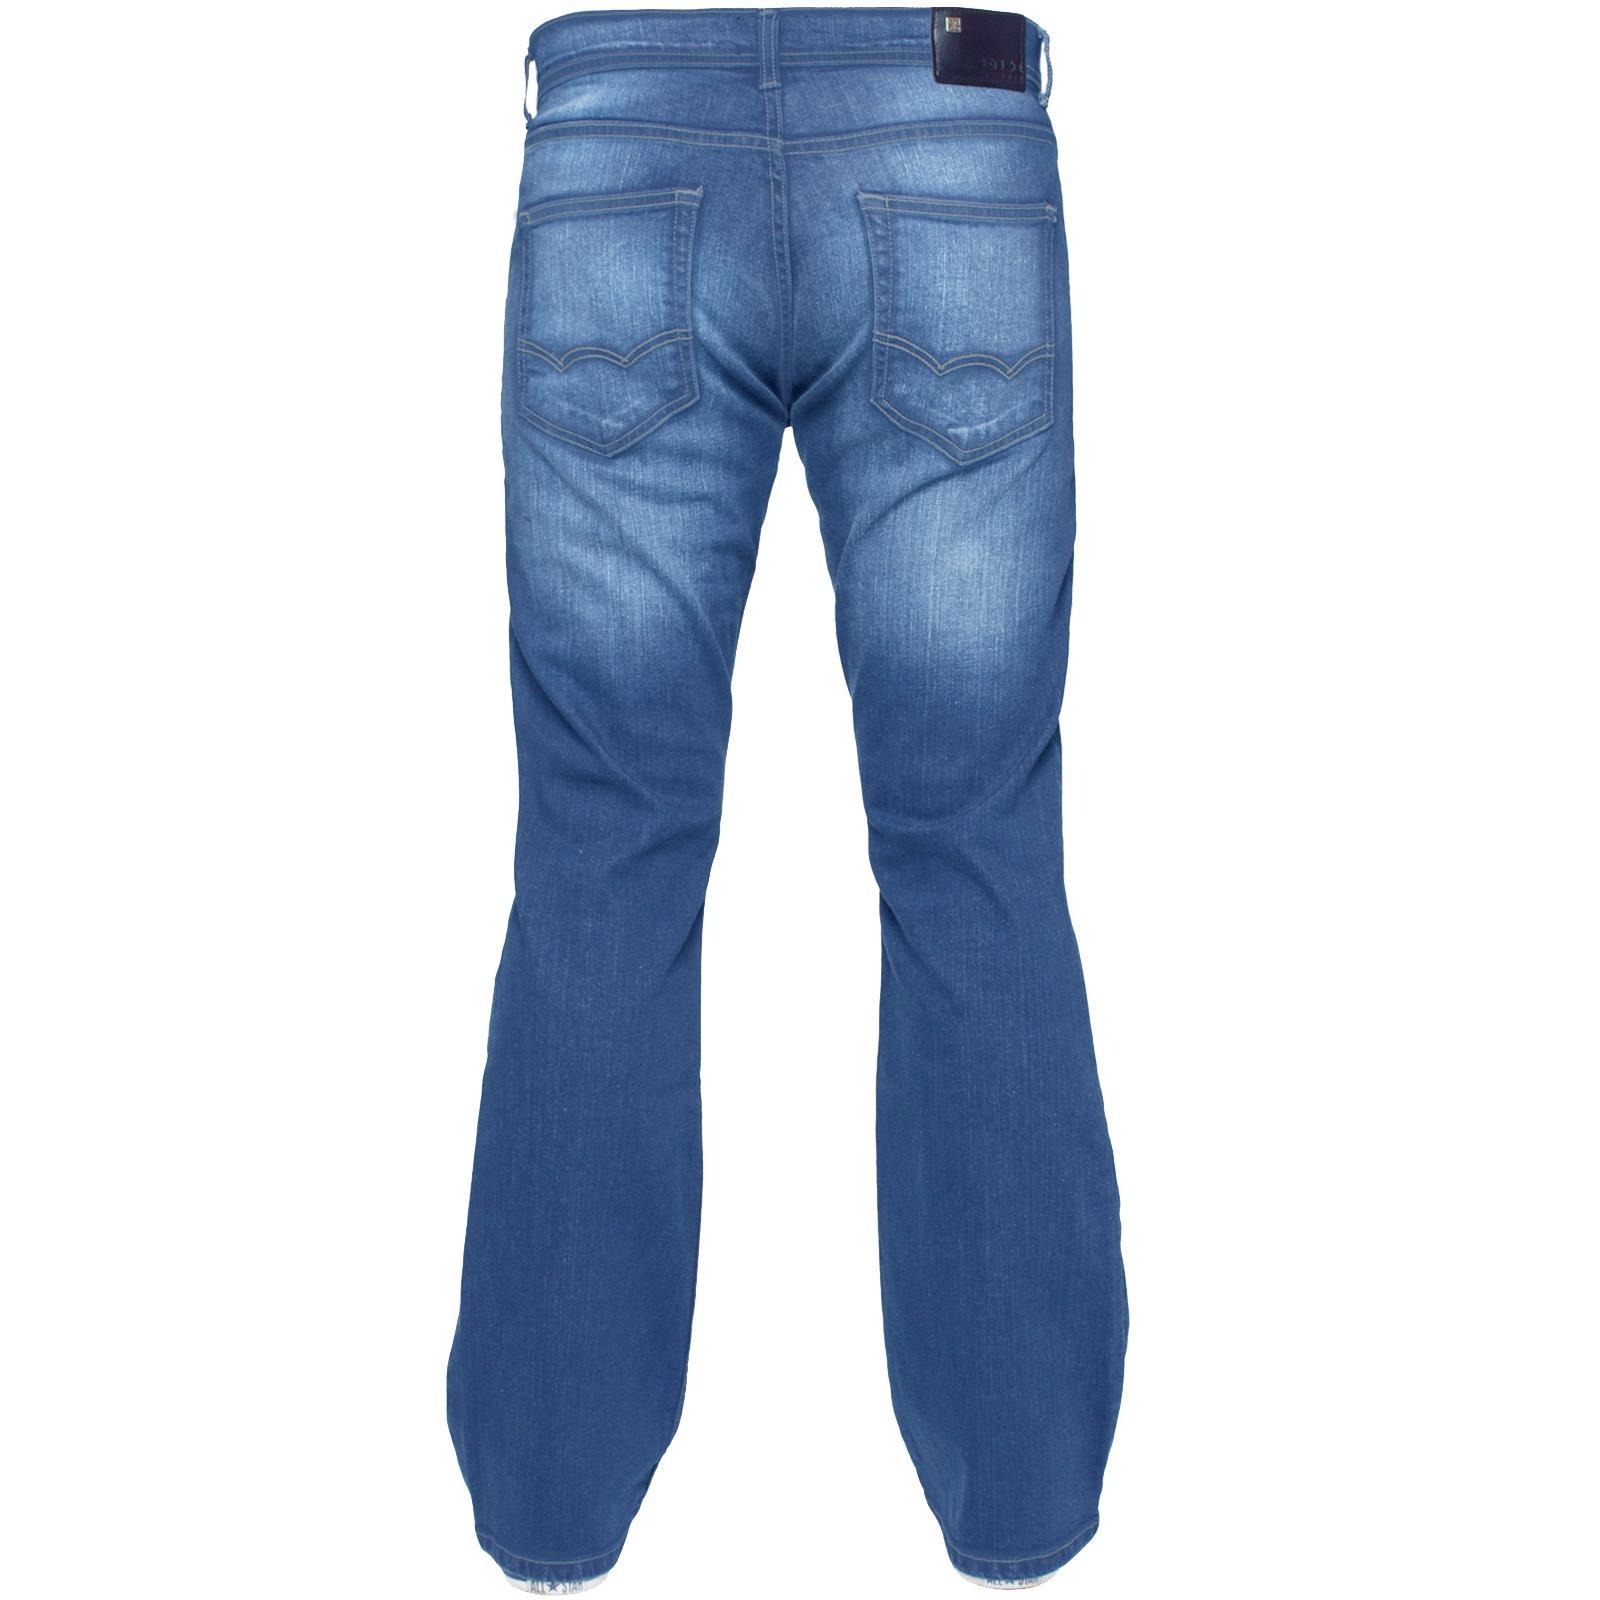 Enzo-Mens-Big-Tall-Jeans-Leg-King-Size-Denim-Pants-Chino-Trousers-Pants-44-034-60-034 thumbnail 106